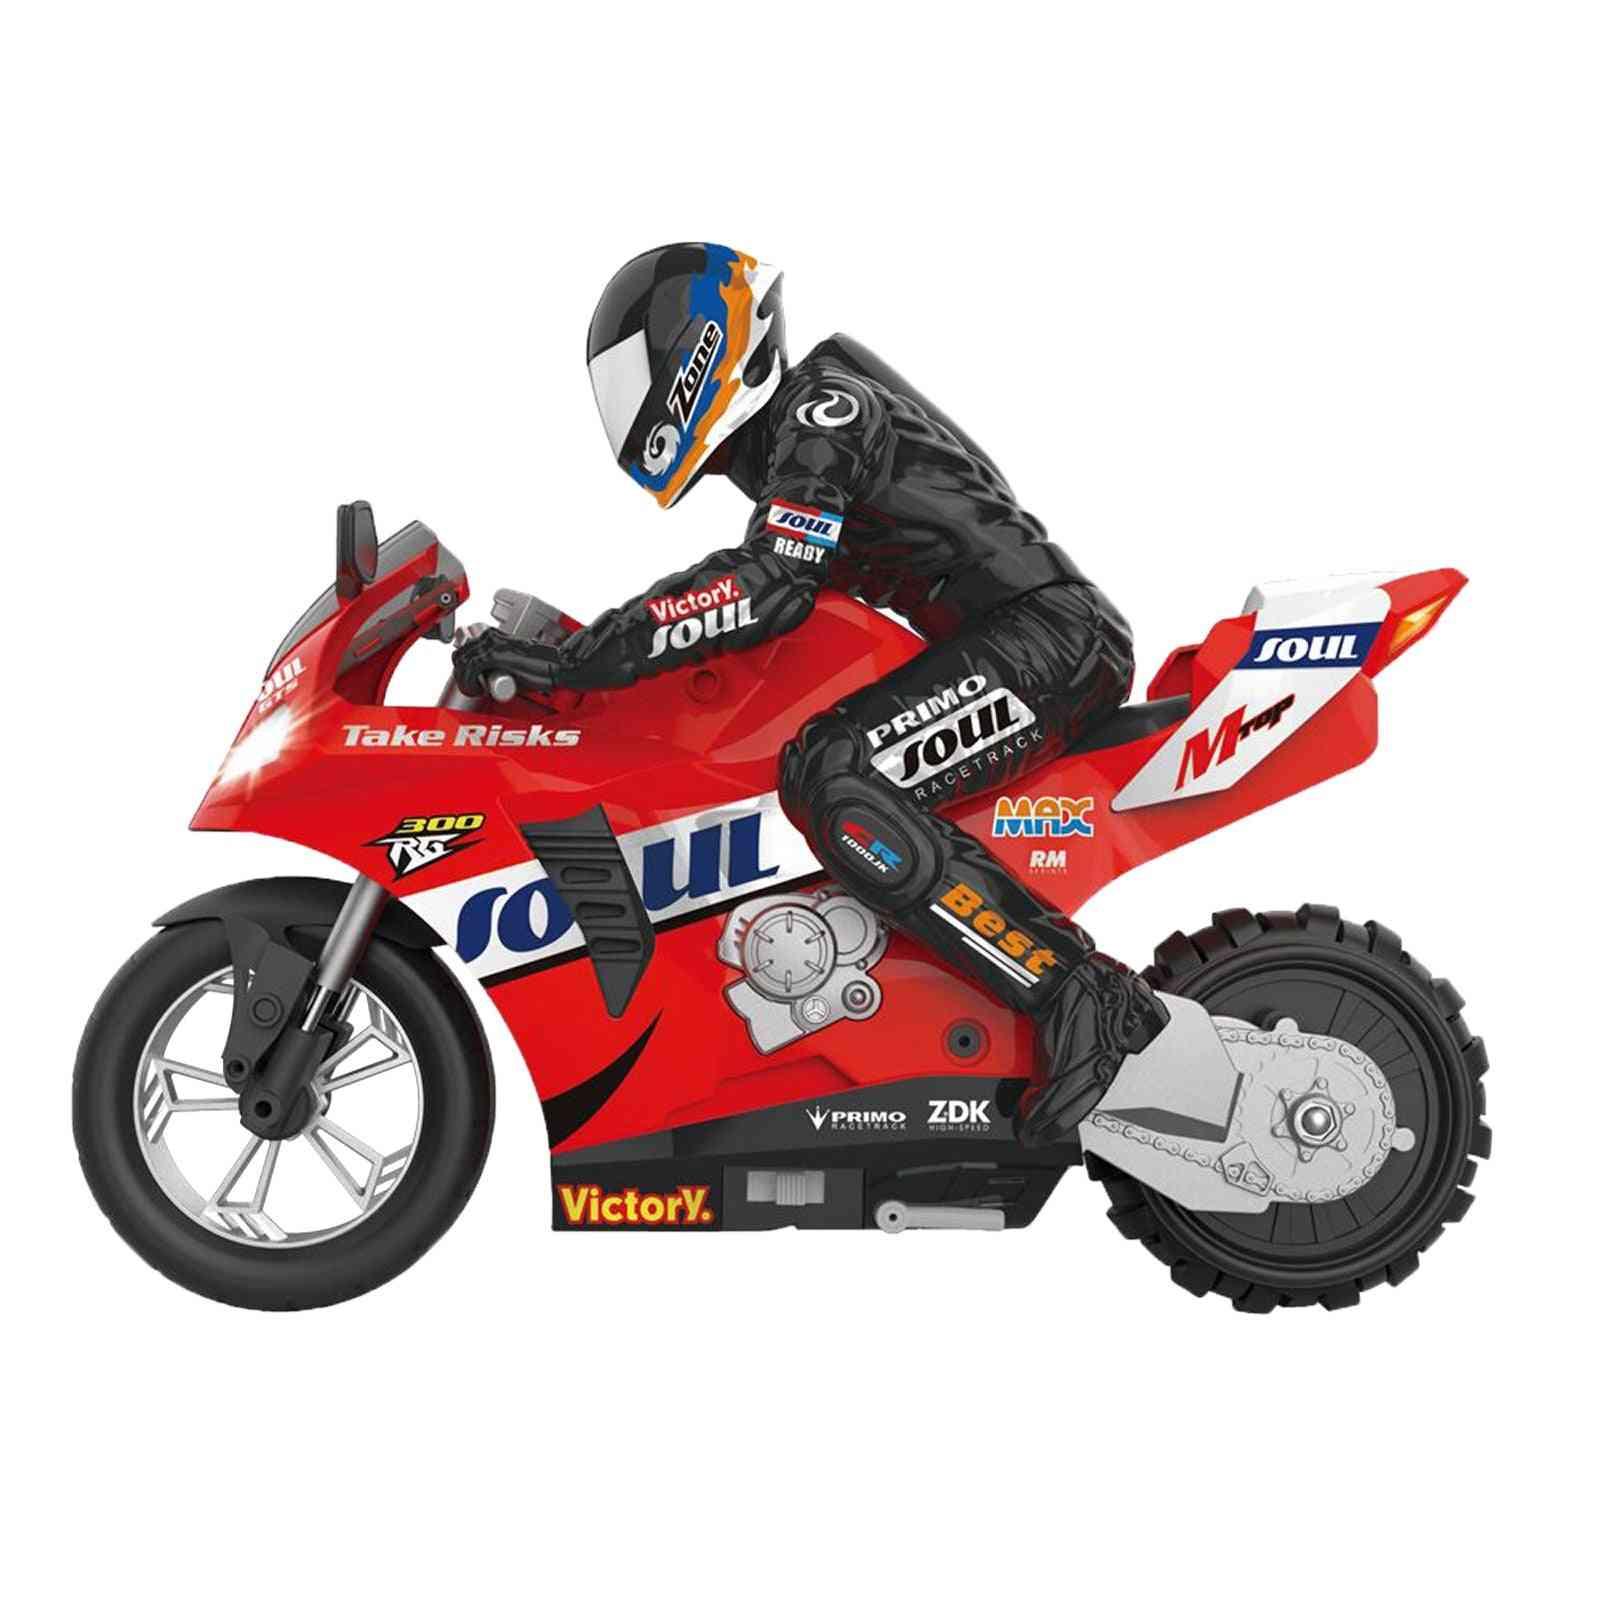 Self-balancing Rc Motorcycle Car, Remote Control Drift Boy Toy, Motorbike